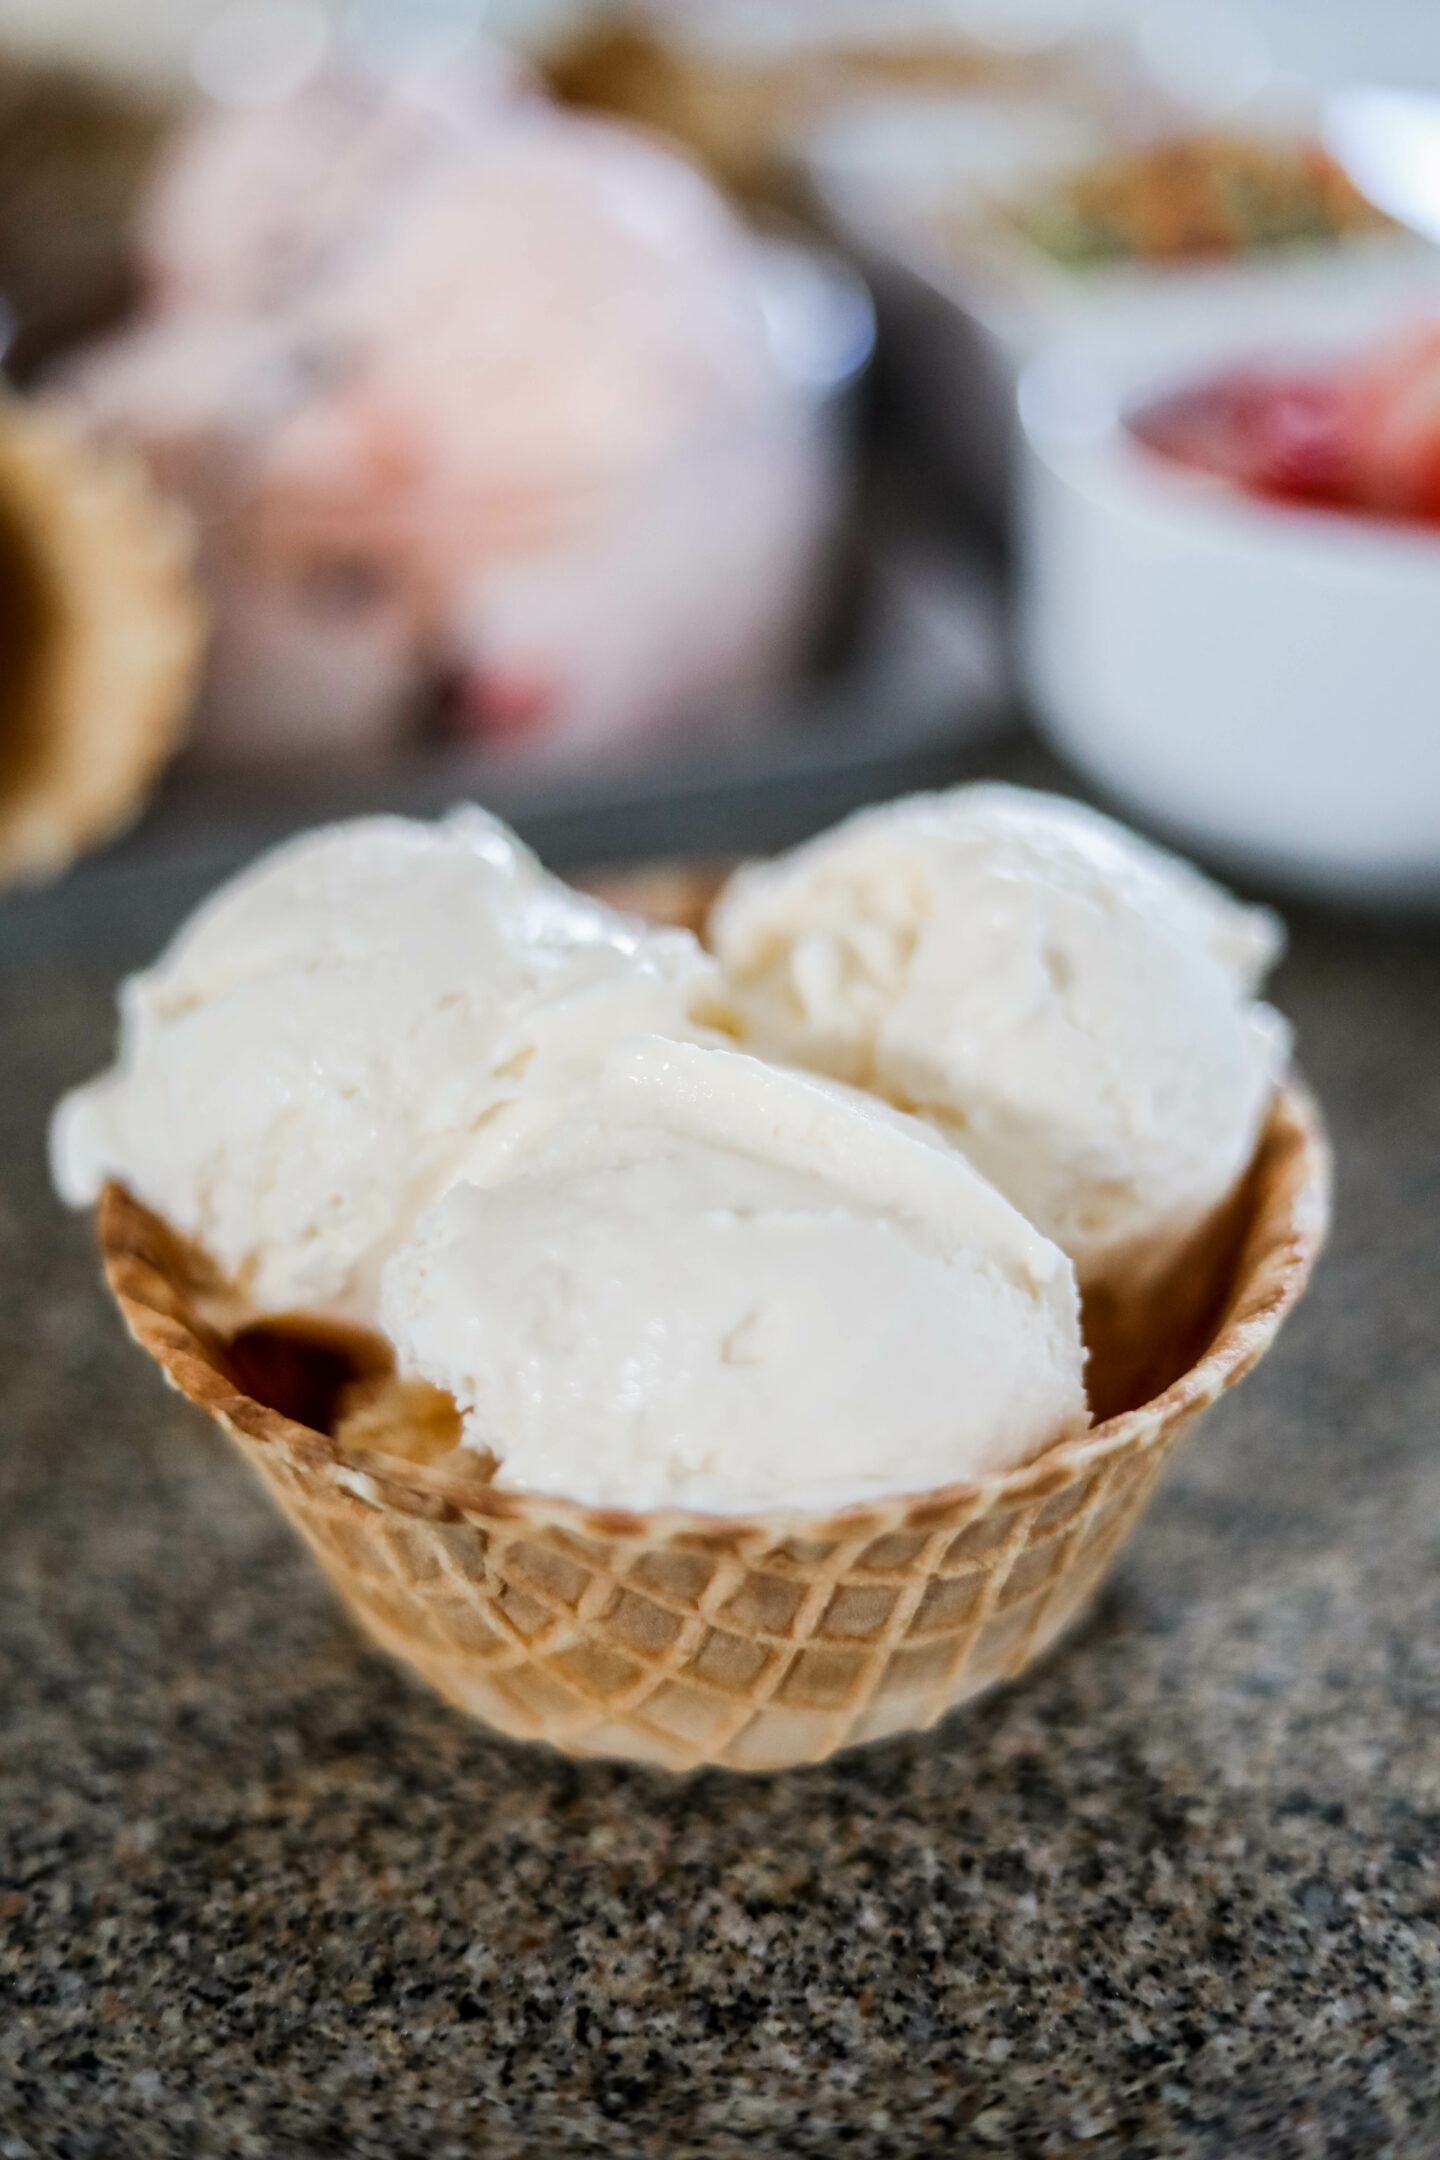 Hudsonville ice cream - creamery vanilla, on Coming Up Roses